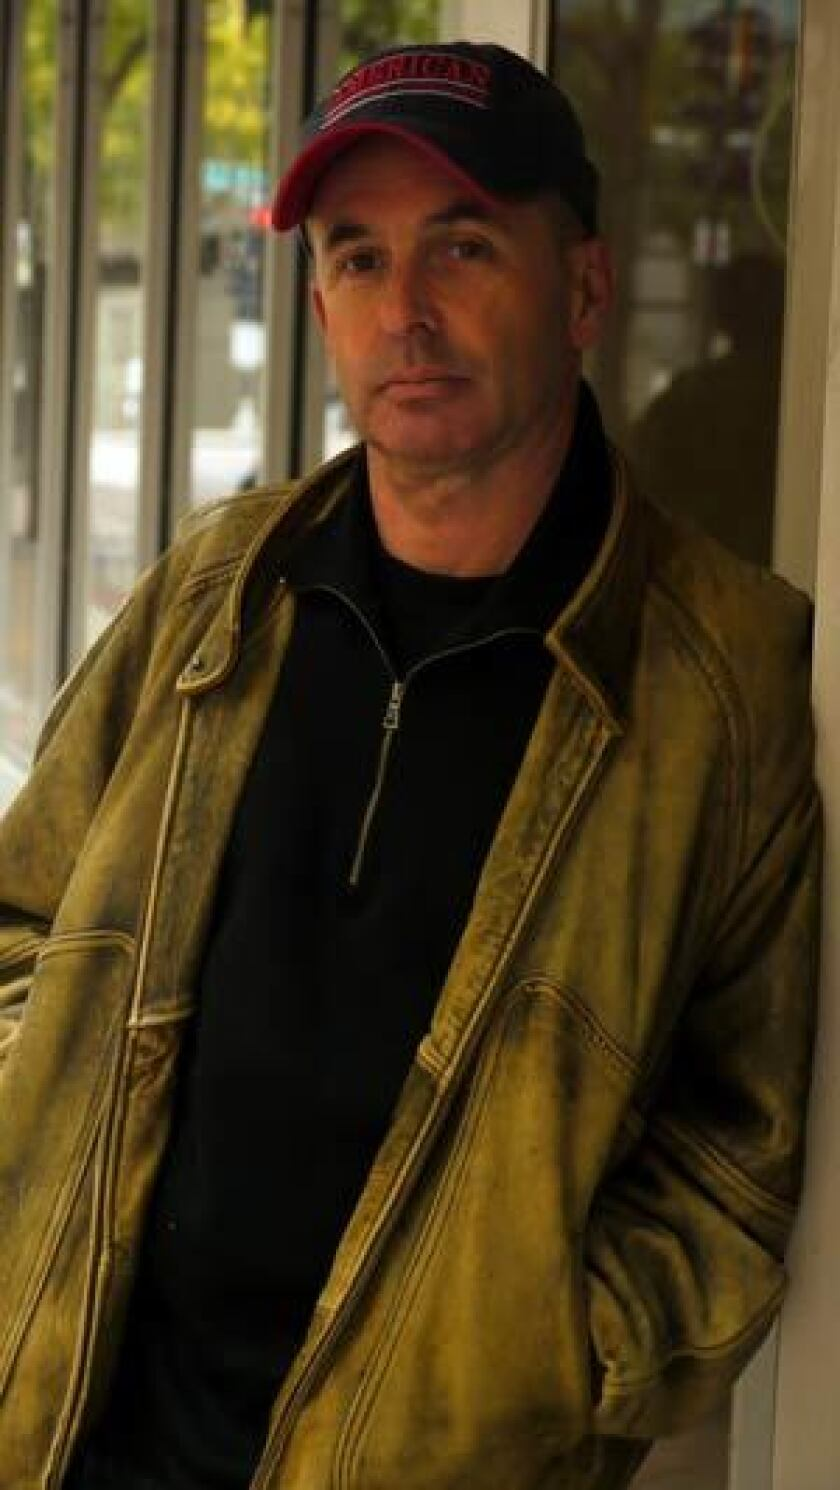 Author Don Winslow